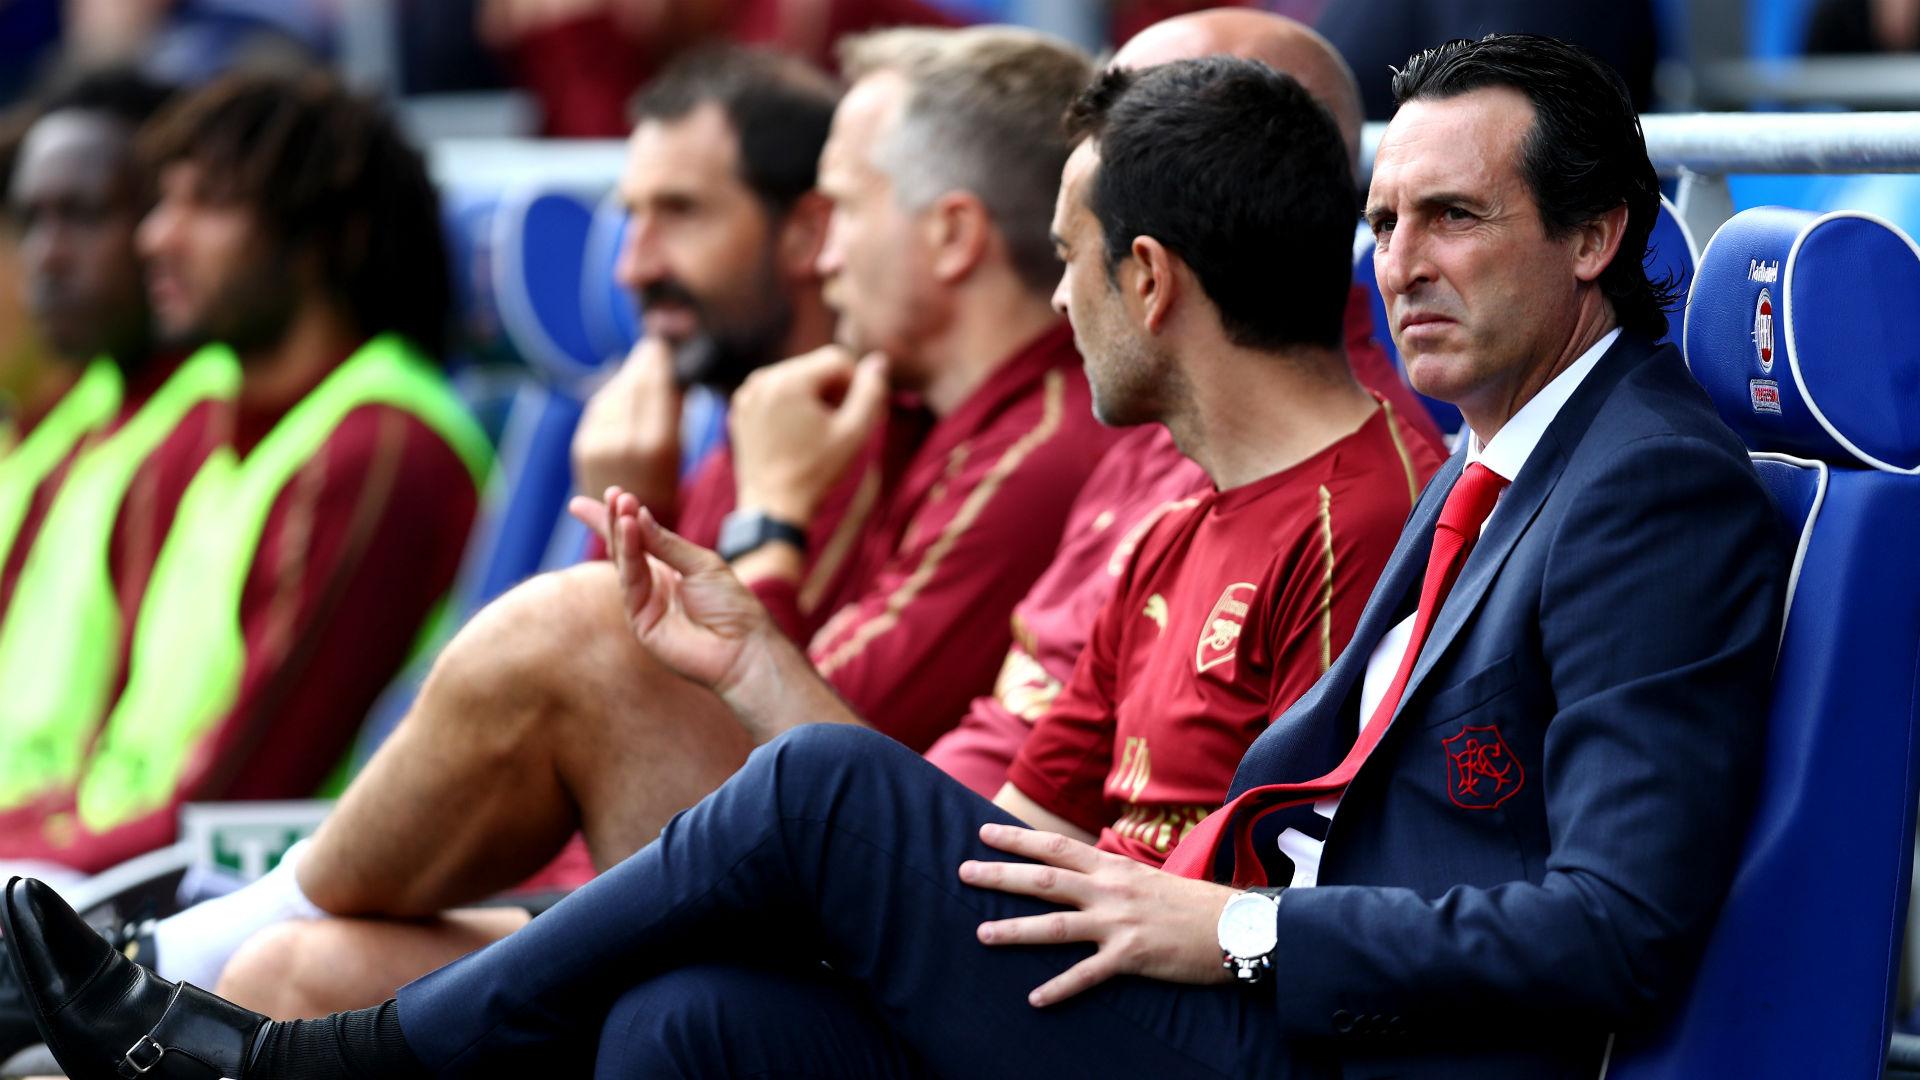 [Match Highlights] Arsenal 3-1 Brentford - All The Goals & Best Bits